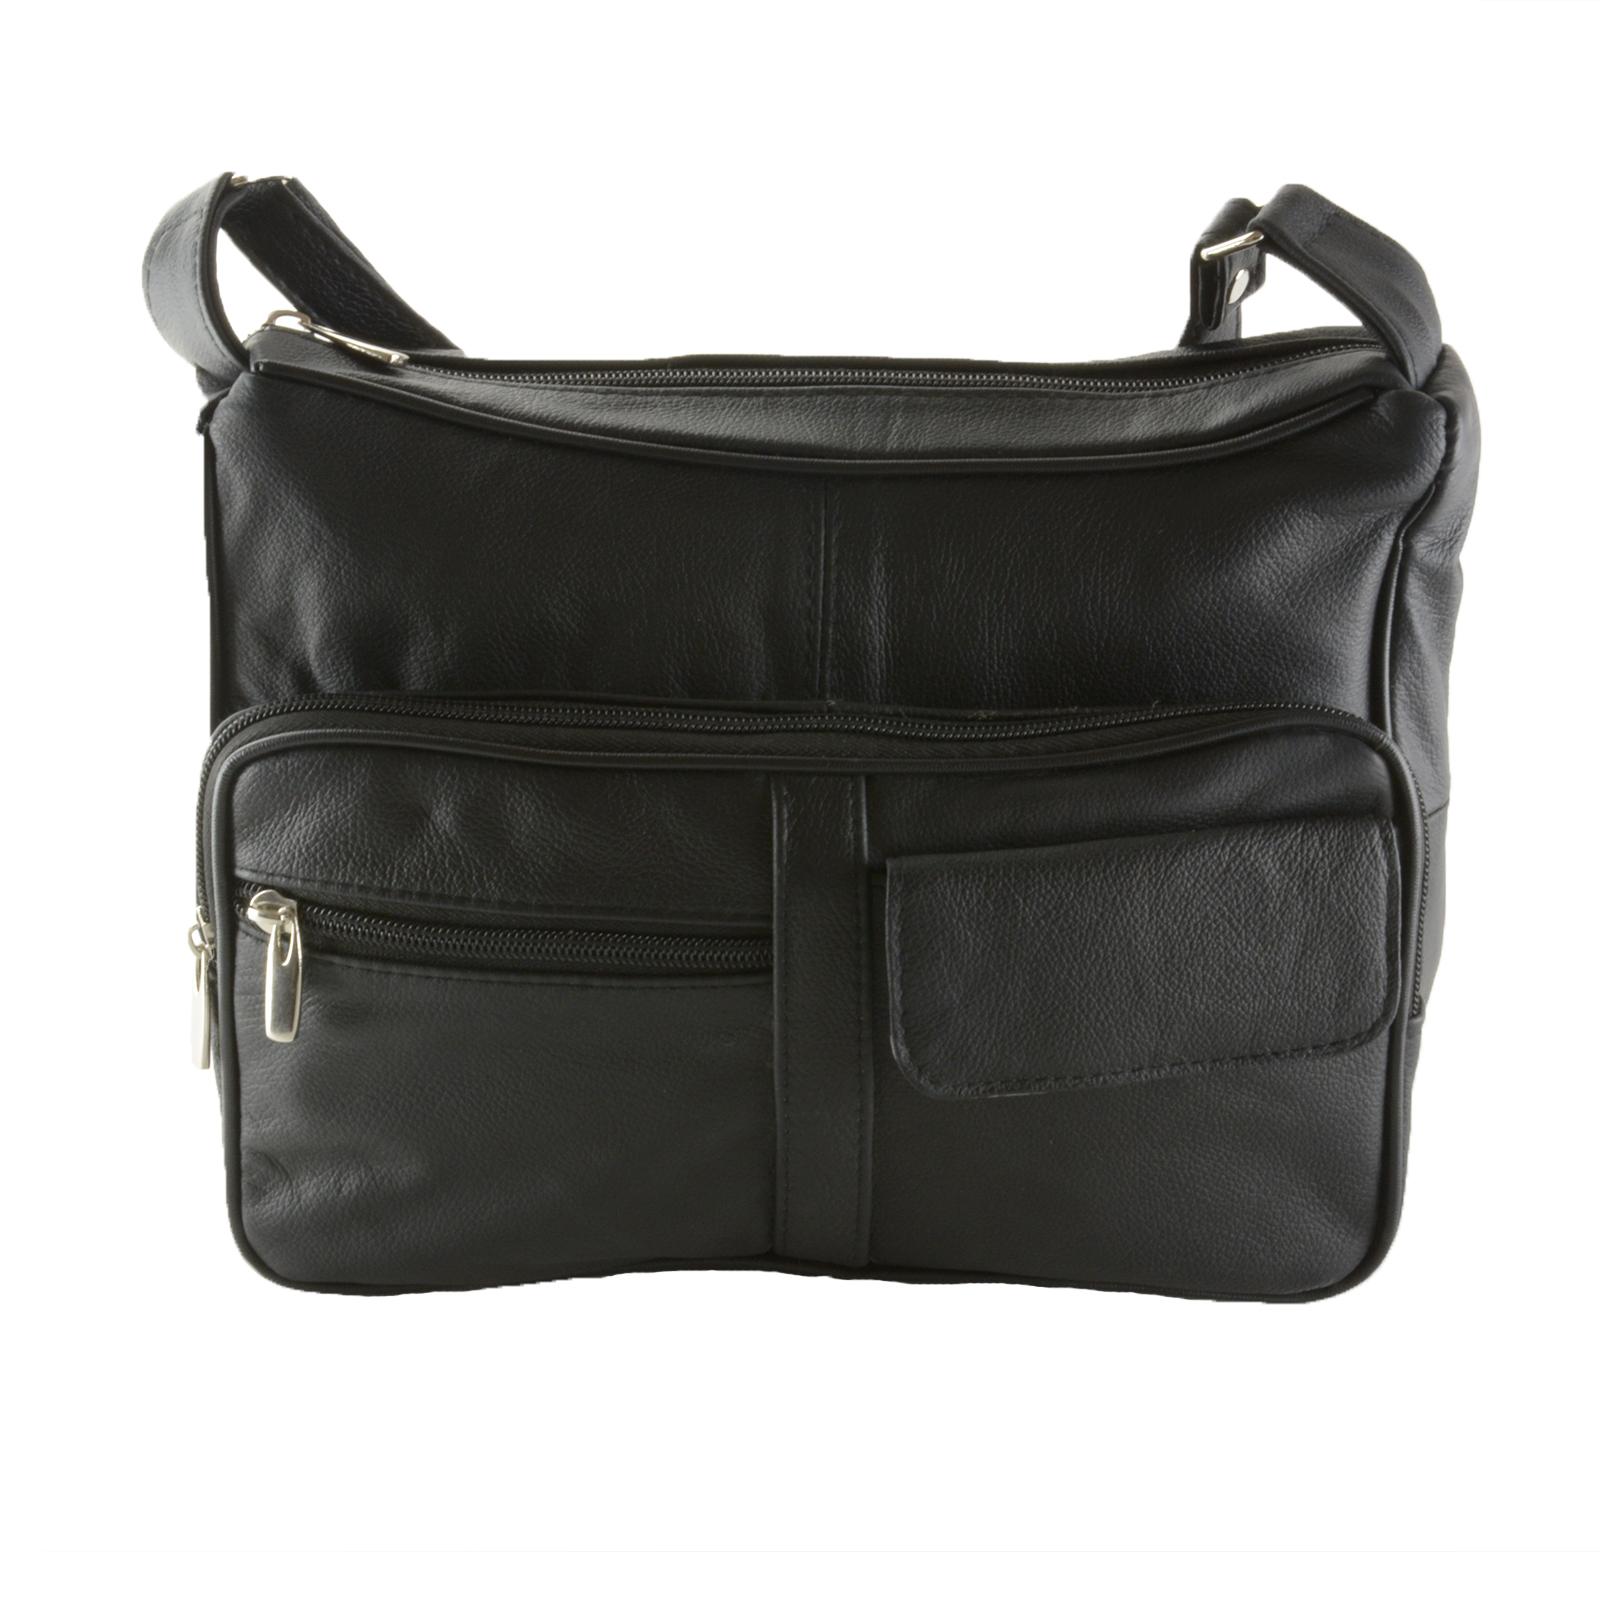 SBR Designs - Women s Leather Organizer Purse Shoulder Bag Multiple Pockets  Cross Body Handbag - Walmart.com b1e0a3682a926